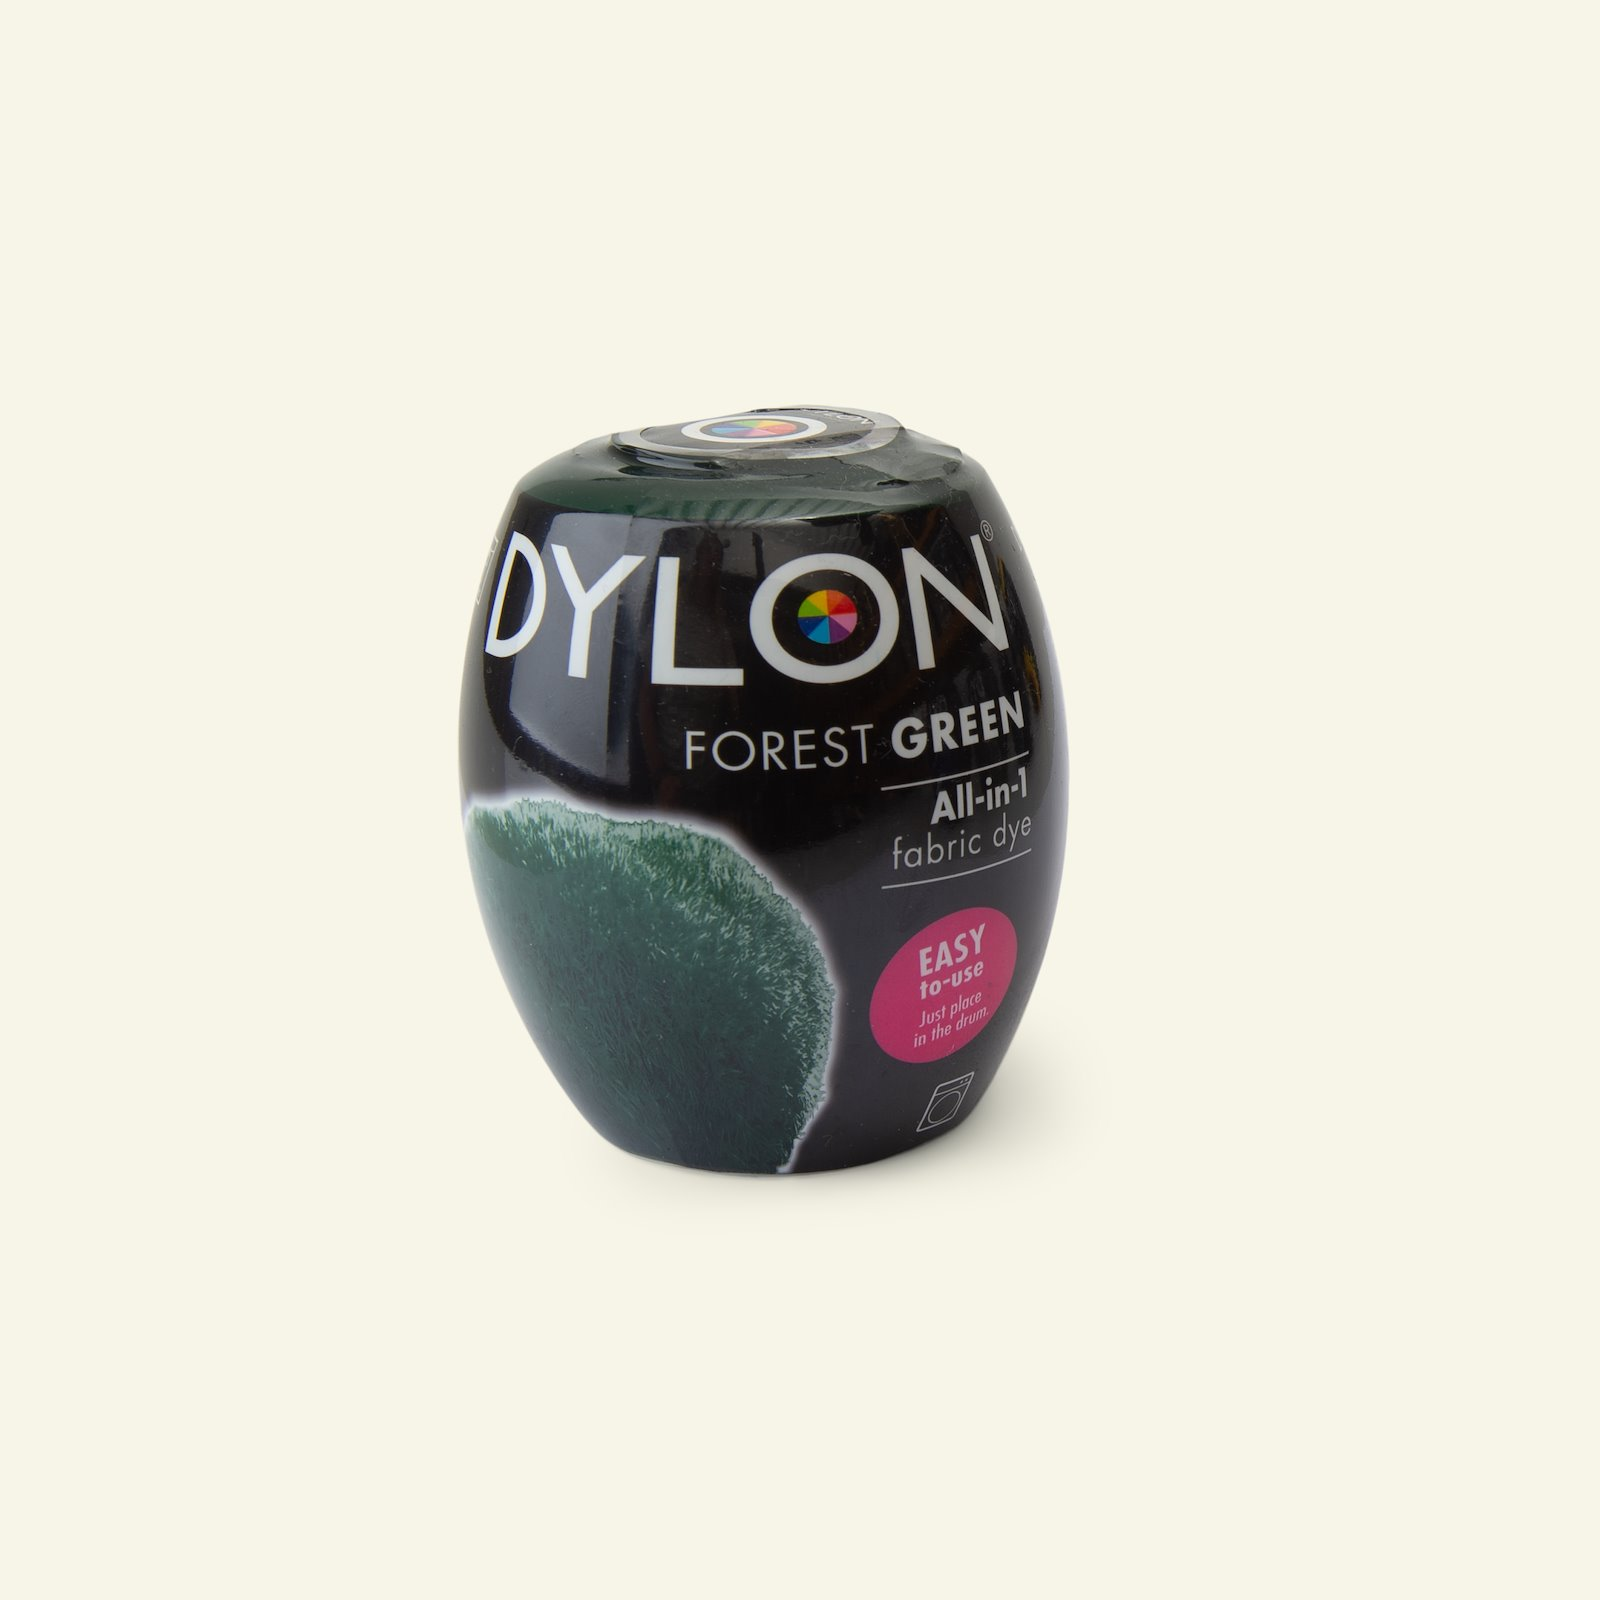 Dylon fabric dye for machine dark green 29704_pack_b